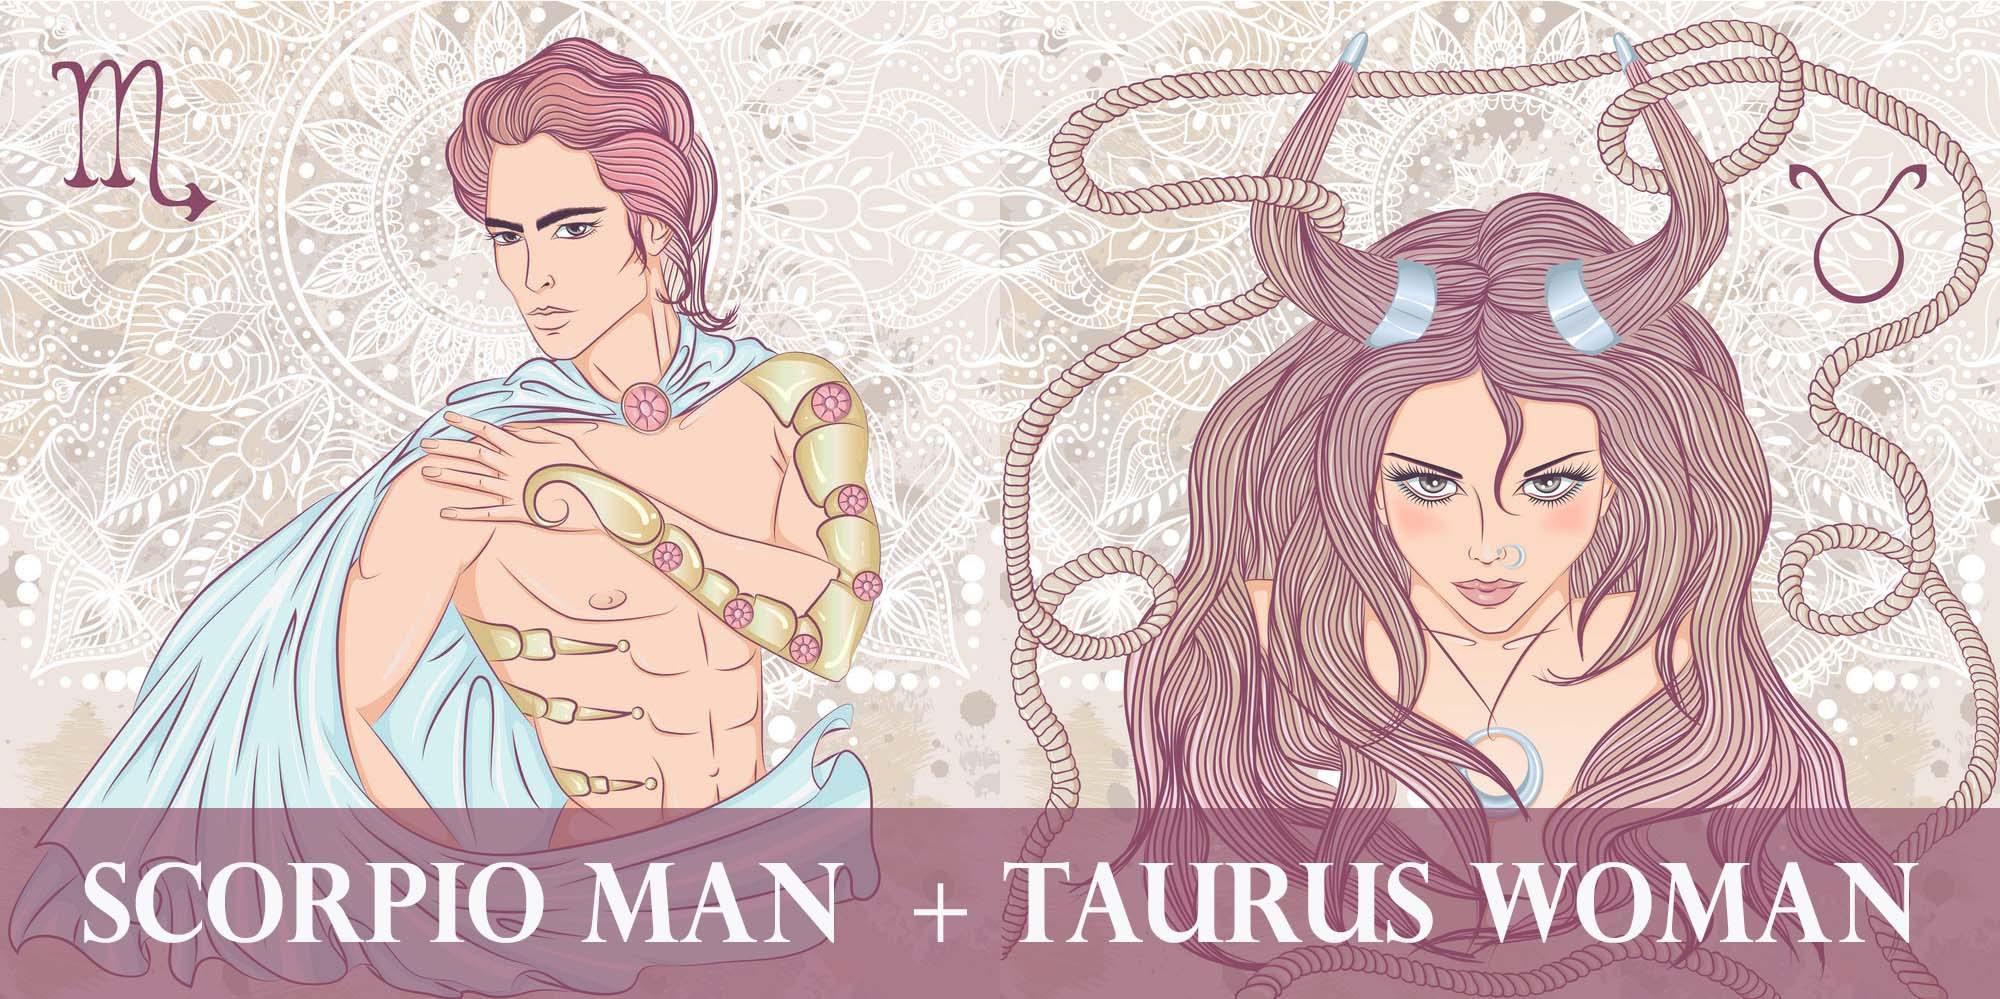 Taurus marriage man scorpio woman Scorpio Man